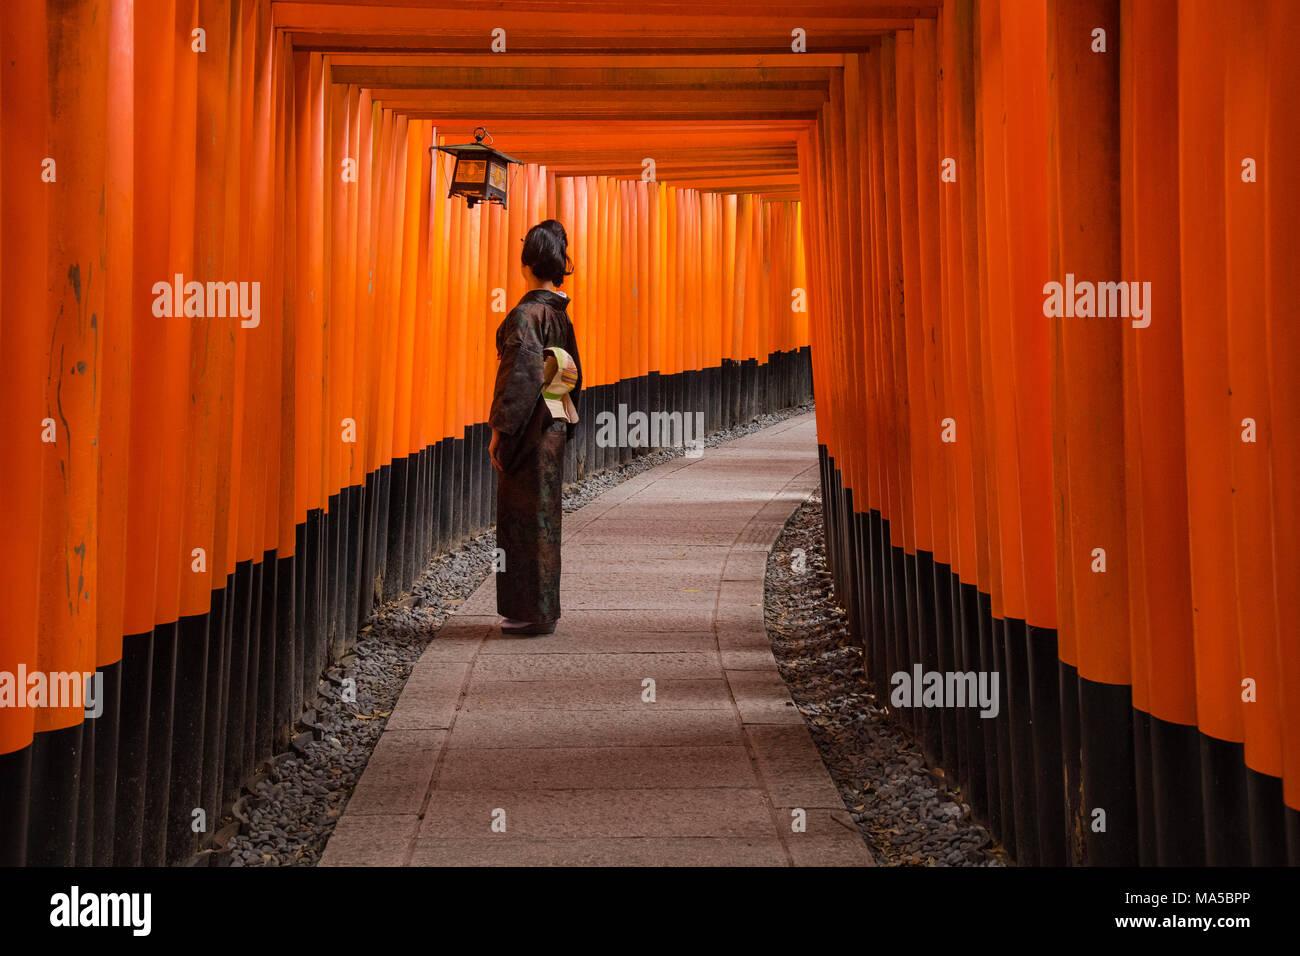 Asia, Japan, Nihon, Nippon, Kyoto, Senbon Torii Fushimi Inari Taisha Shrine - Stock Image